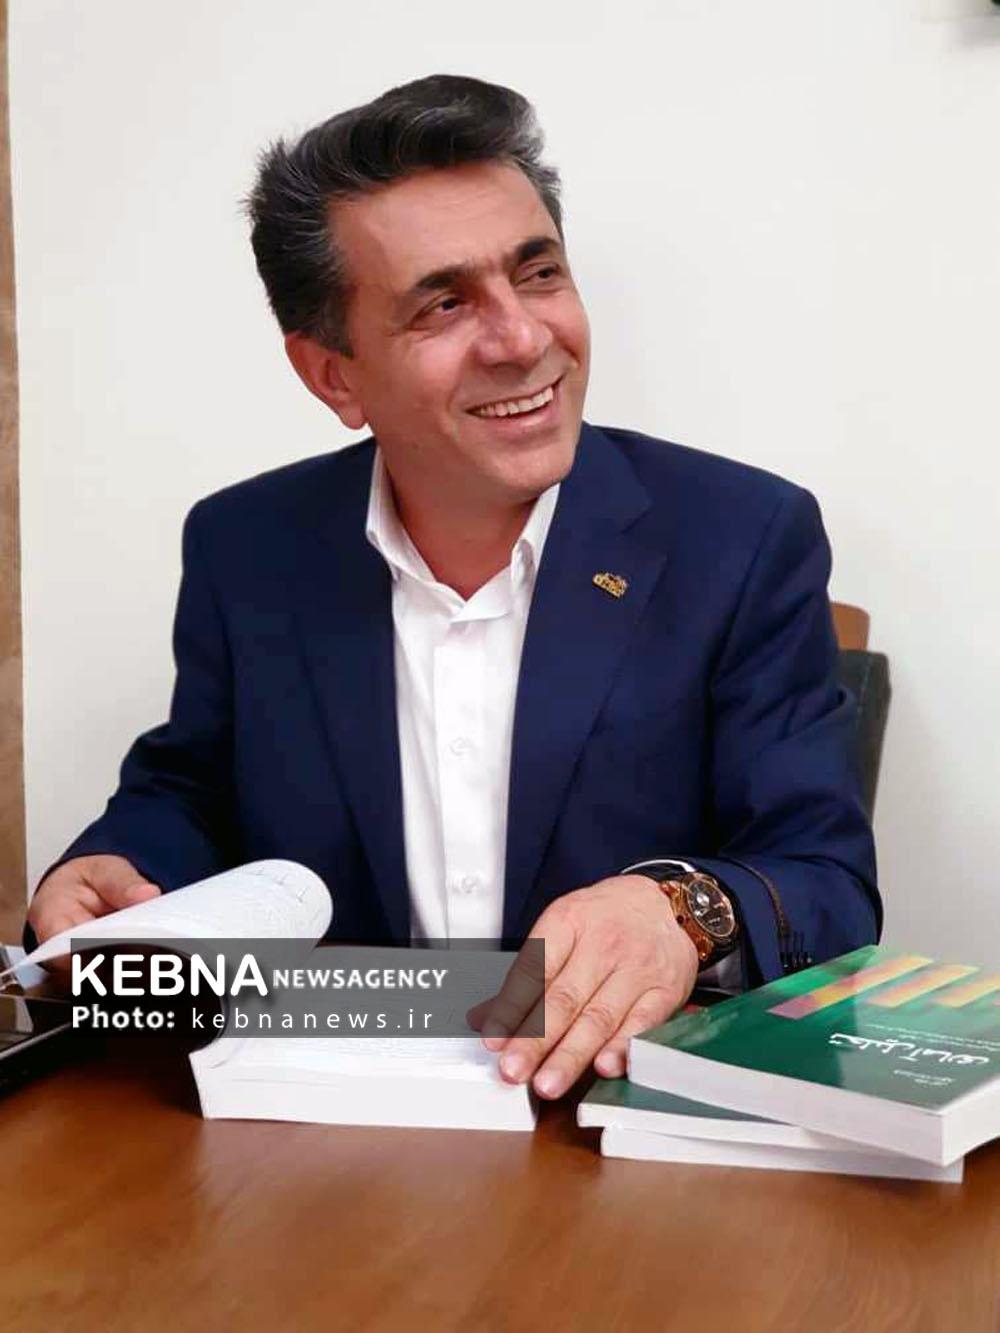 http://www.kebnanews.ir/images/docs/files/000410/nf00410557-1.jpg